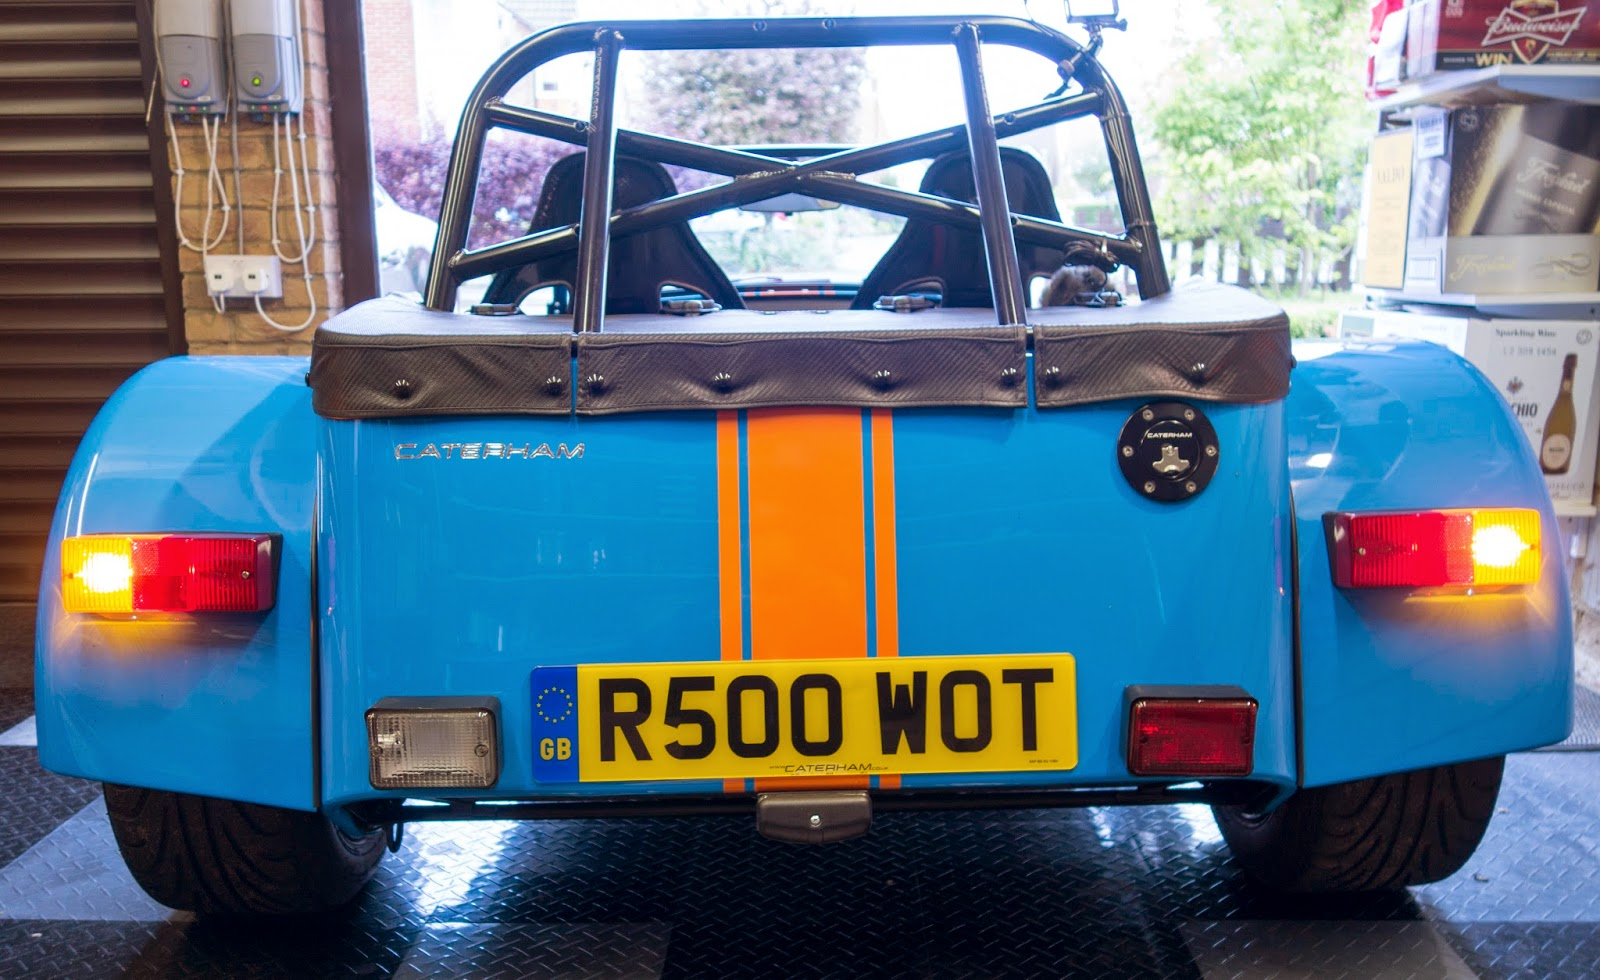 Standard rear indicators illuminated.